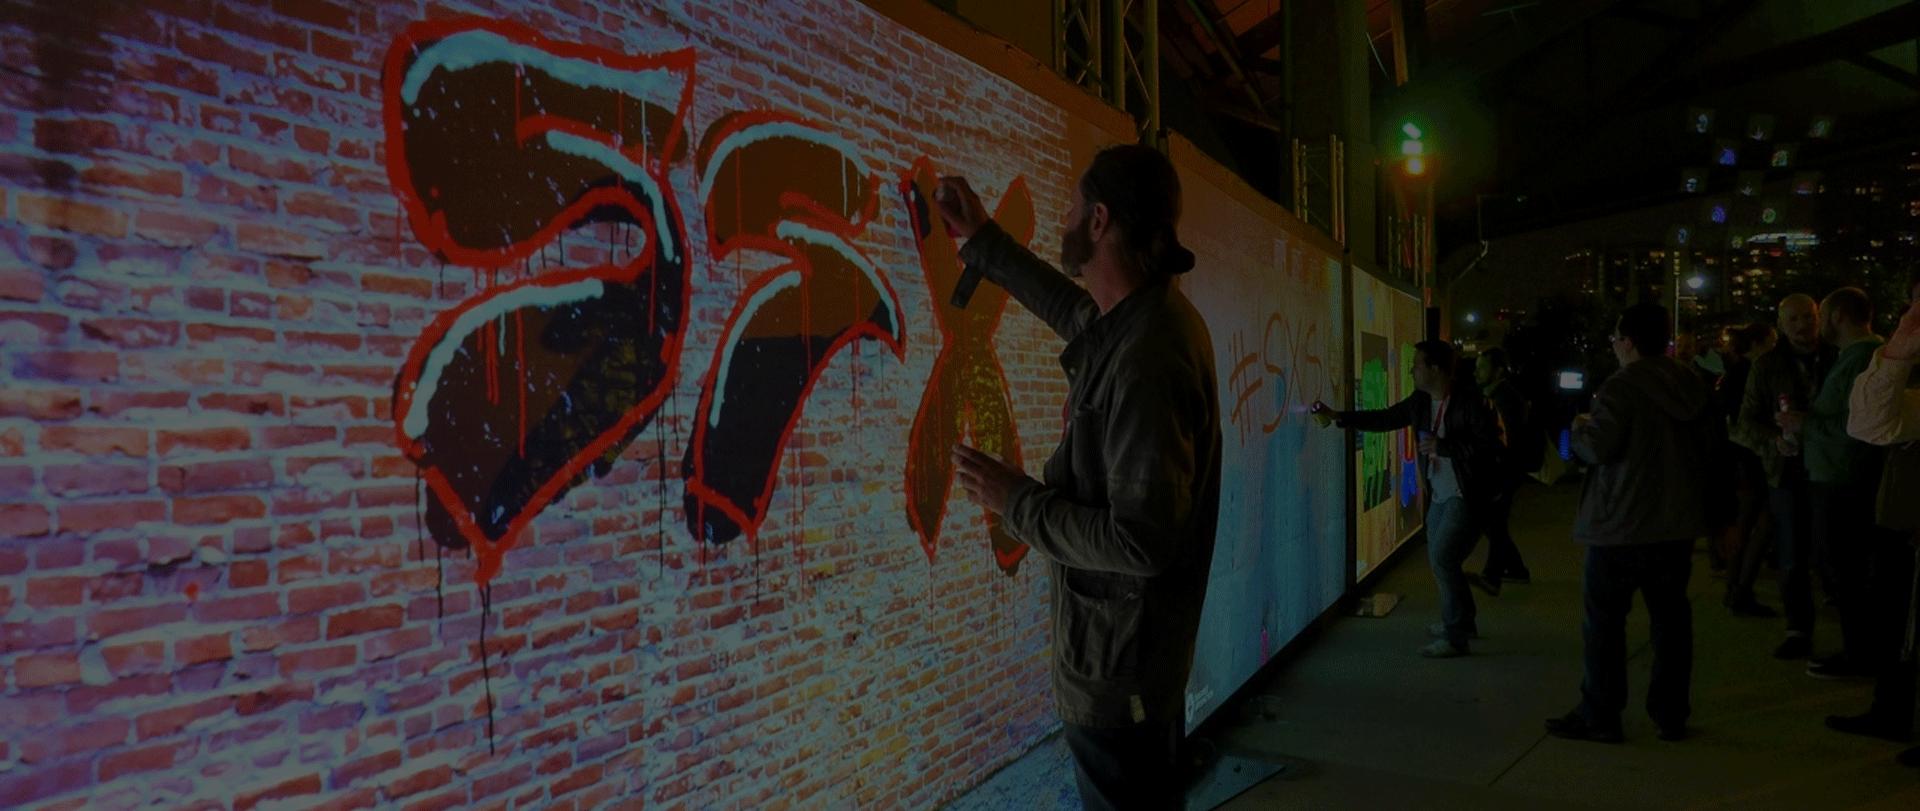 Digital wall graffiti - Digital Wall Graffiti 28